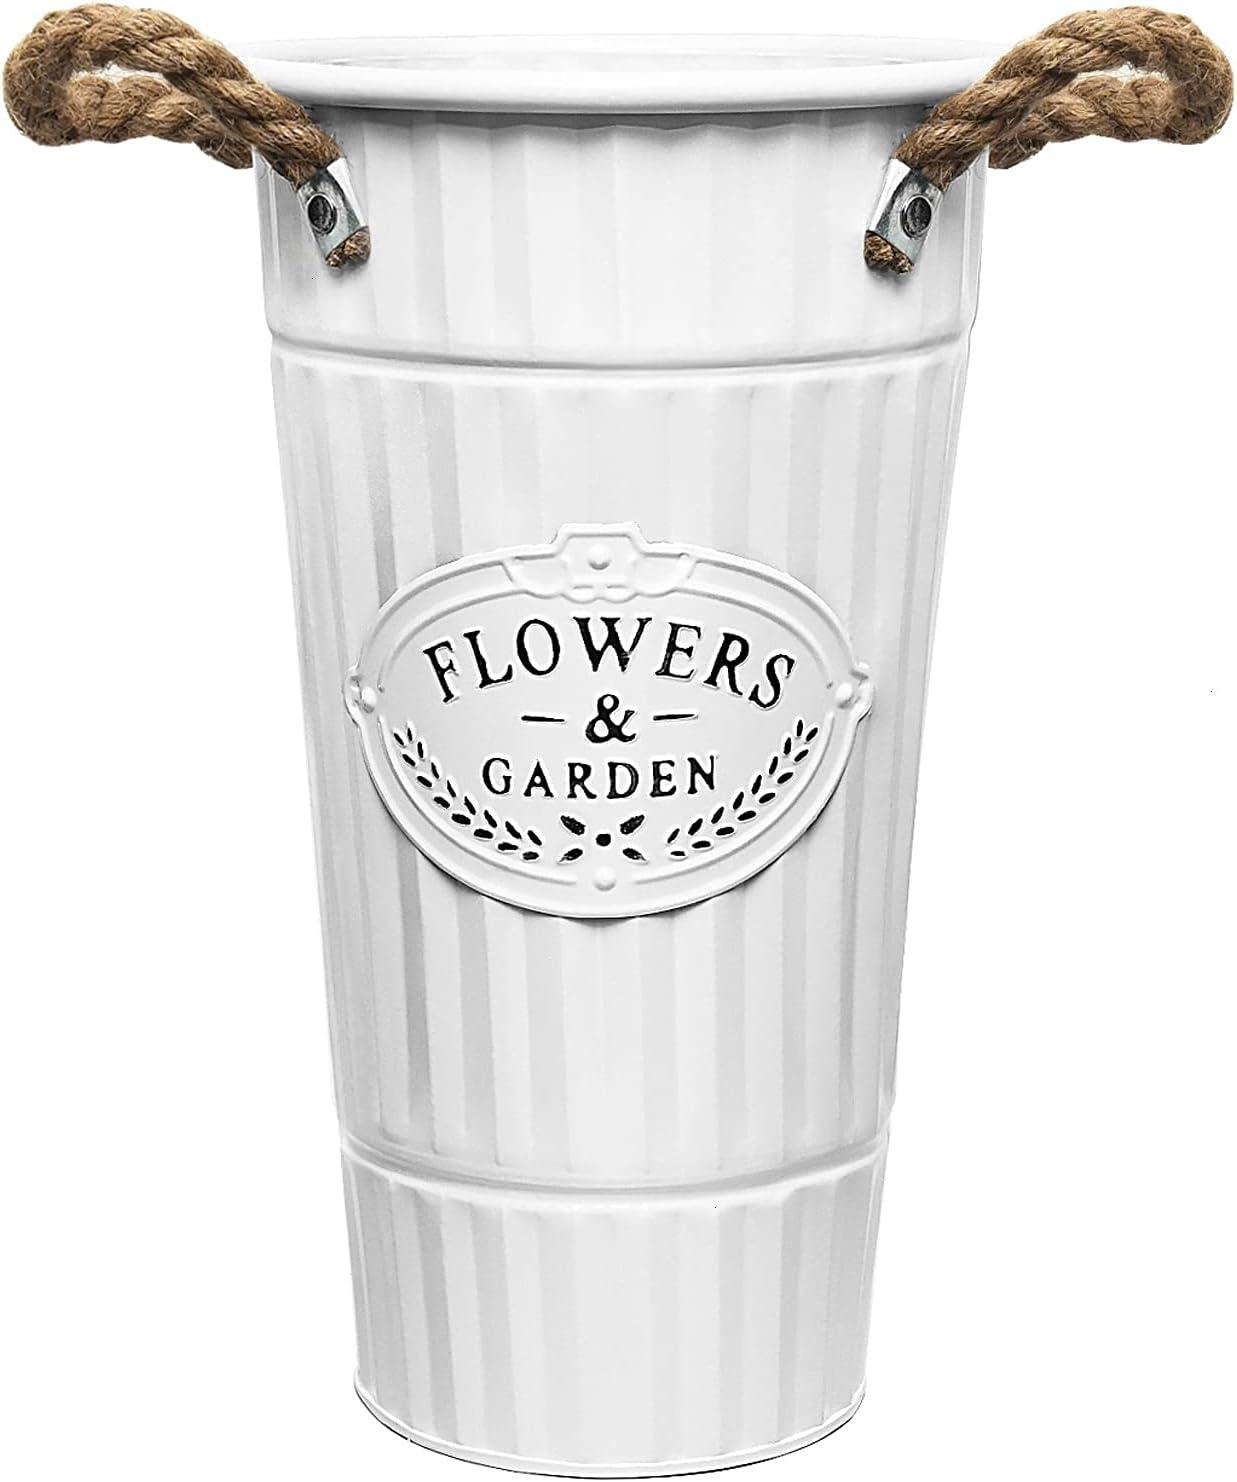 Dinaso Farmhouse Vase 12